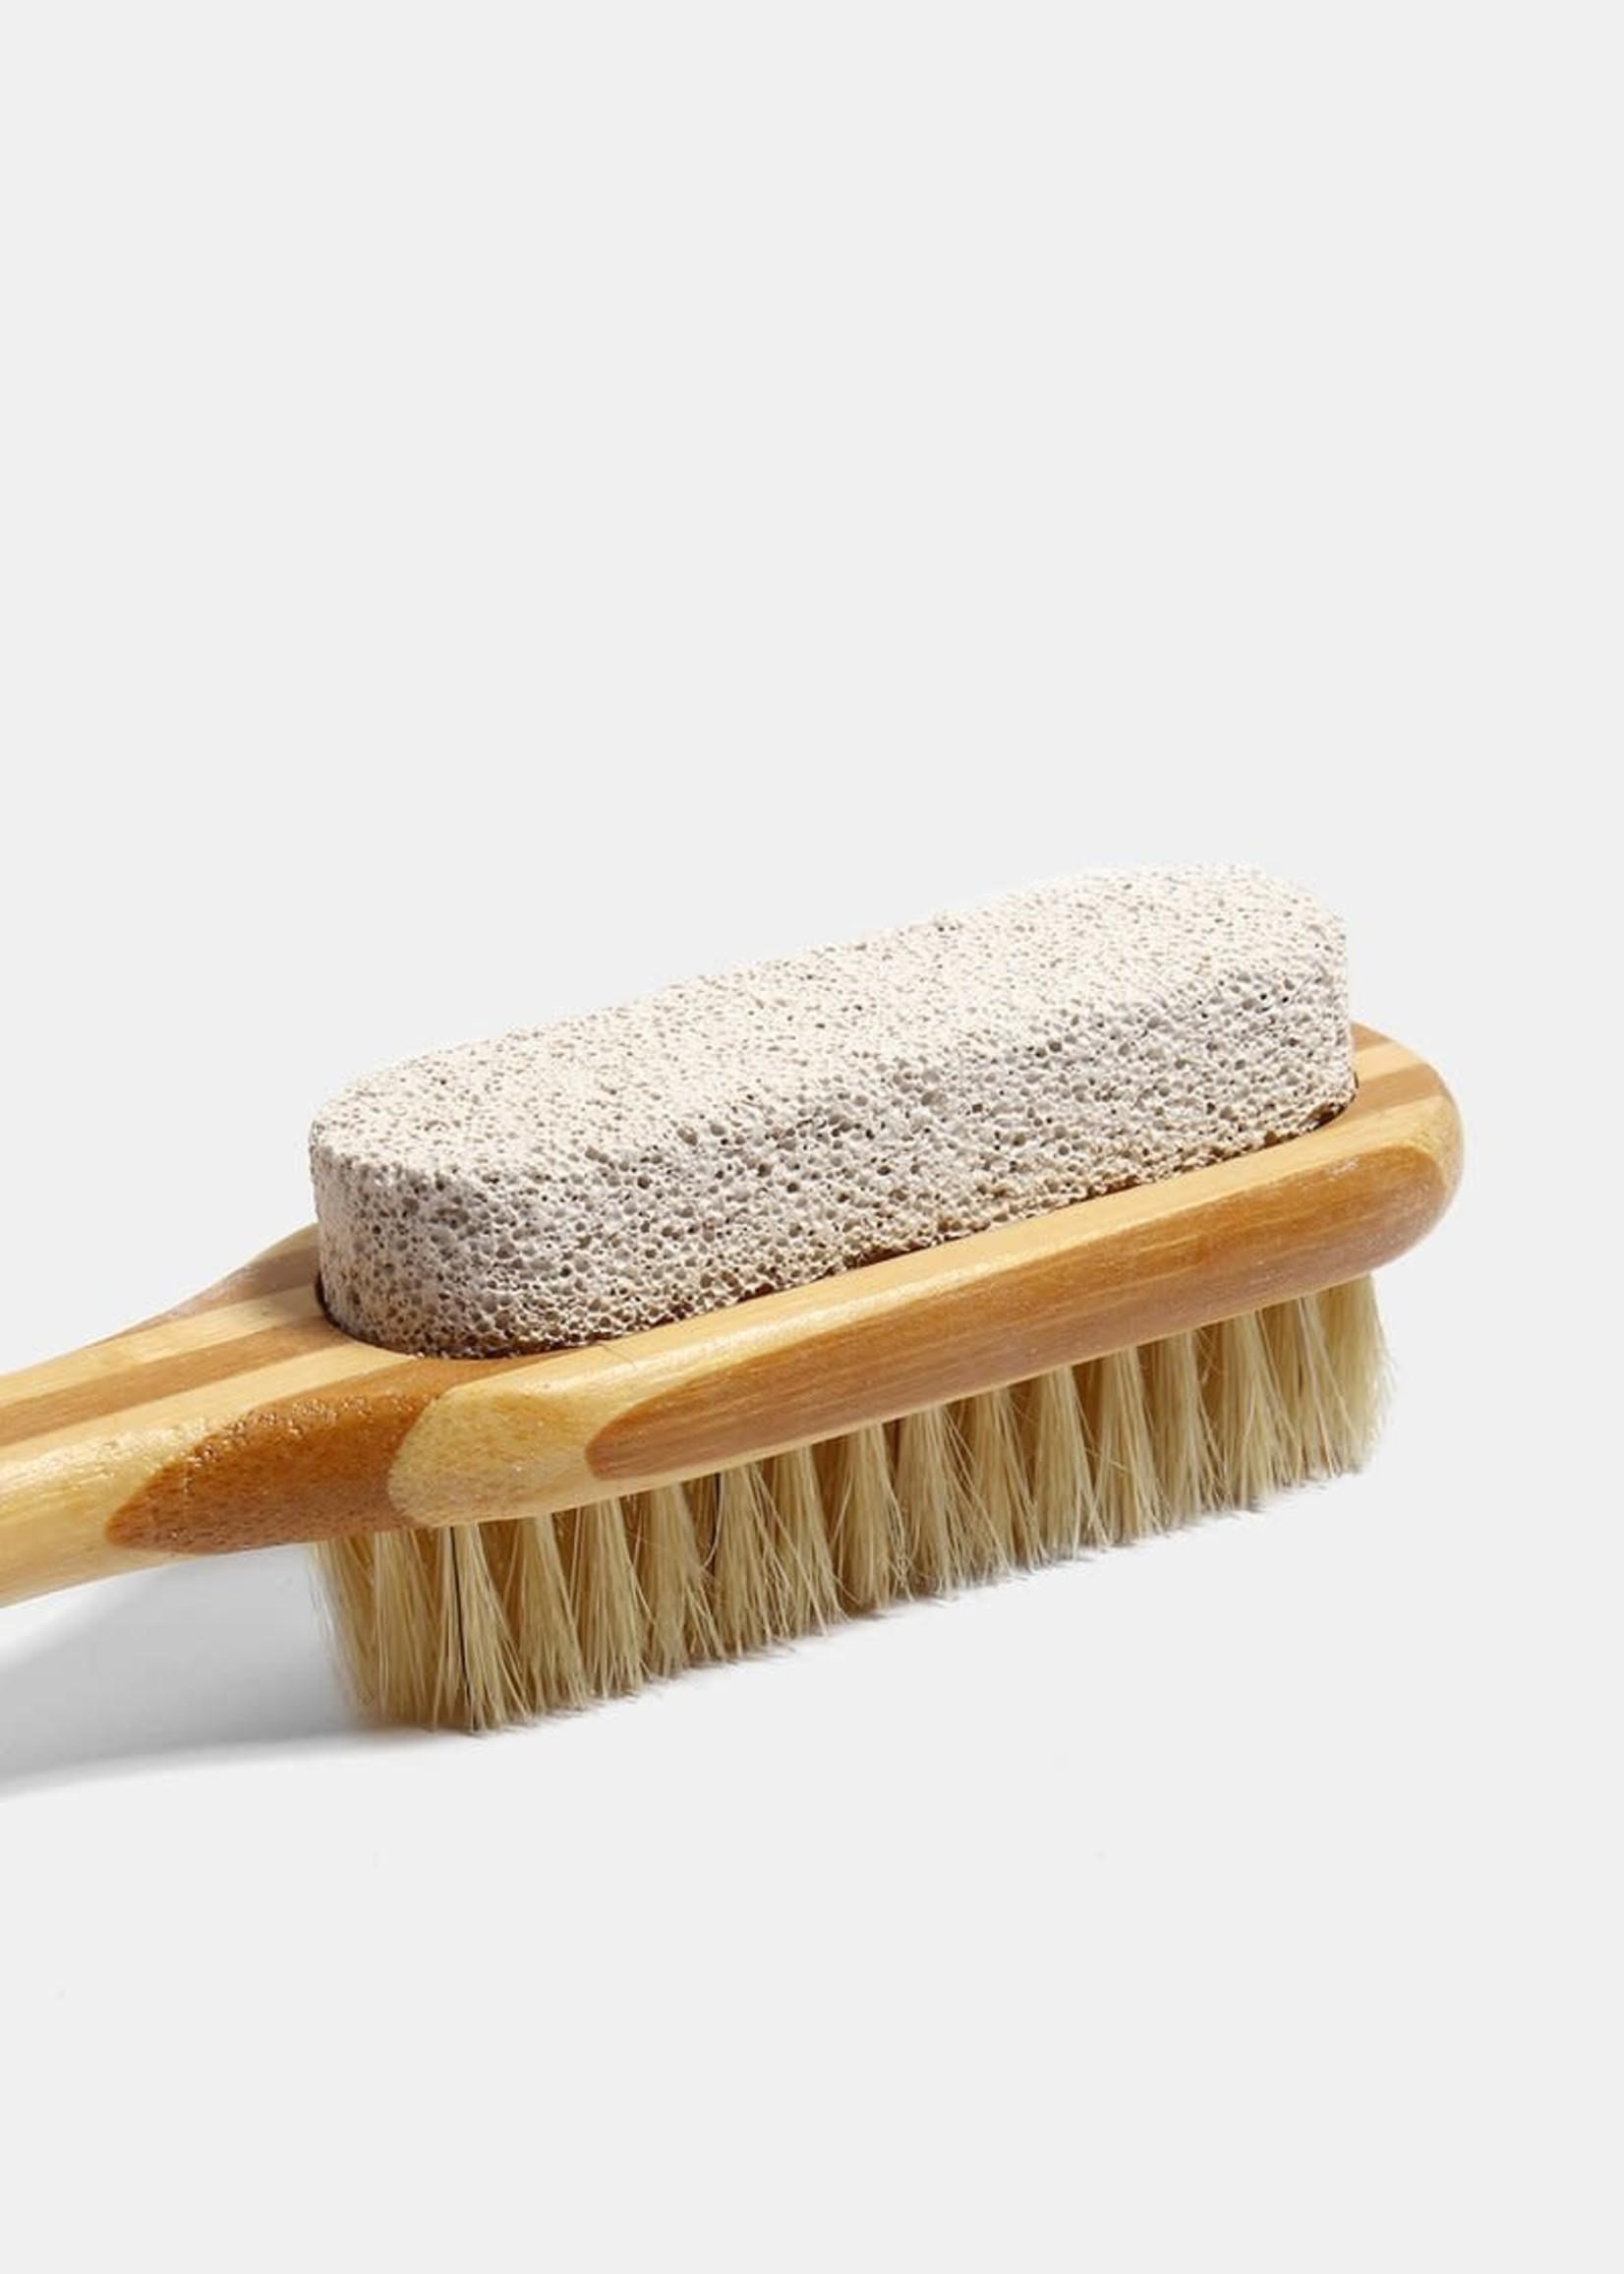 Nail & Pumice Scrub